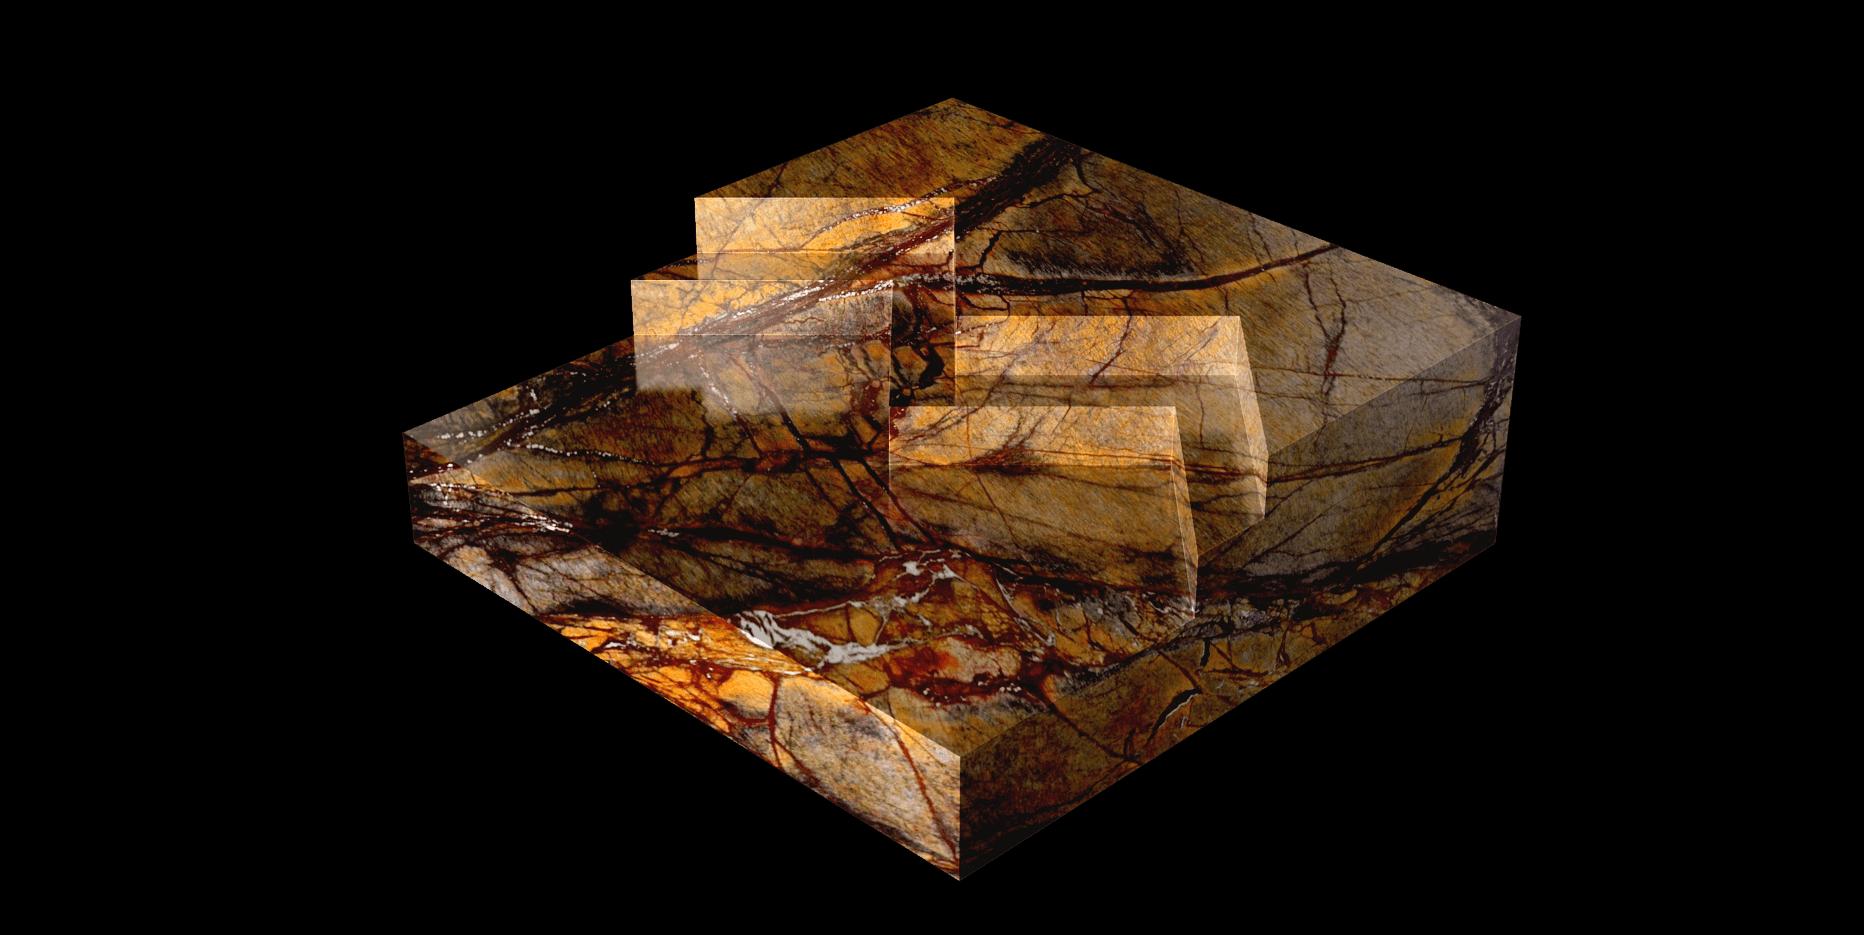 Bidasar Brown фото 2 — камень от Bevers Marmyr